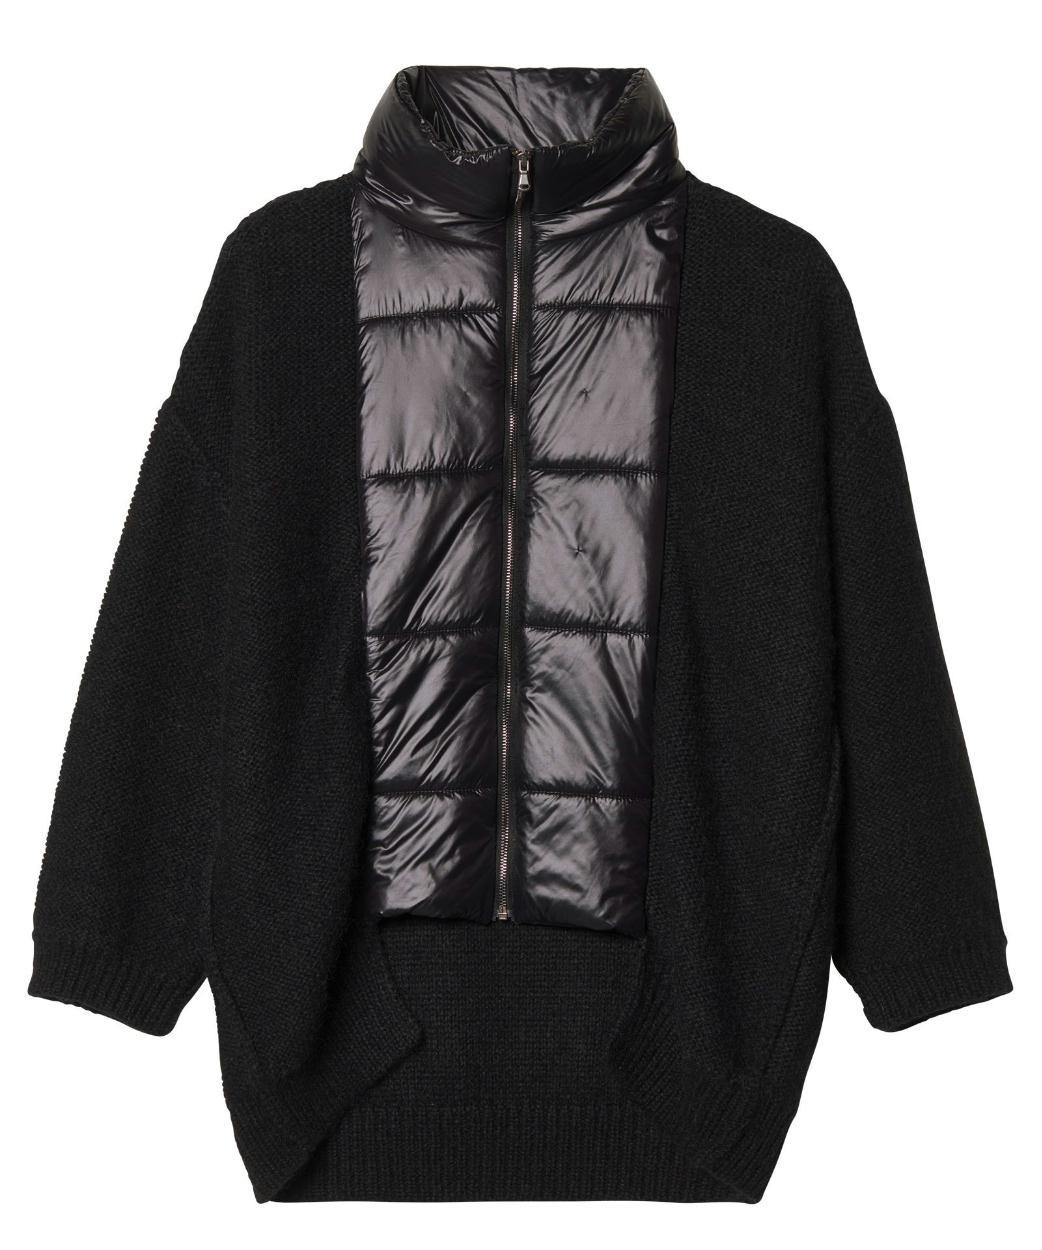 10Days Black Puffer Cardigan 20.654.9103/8